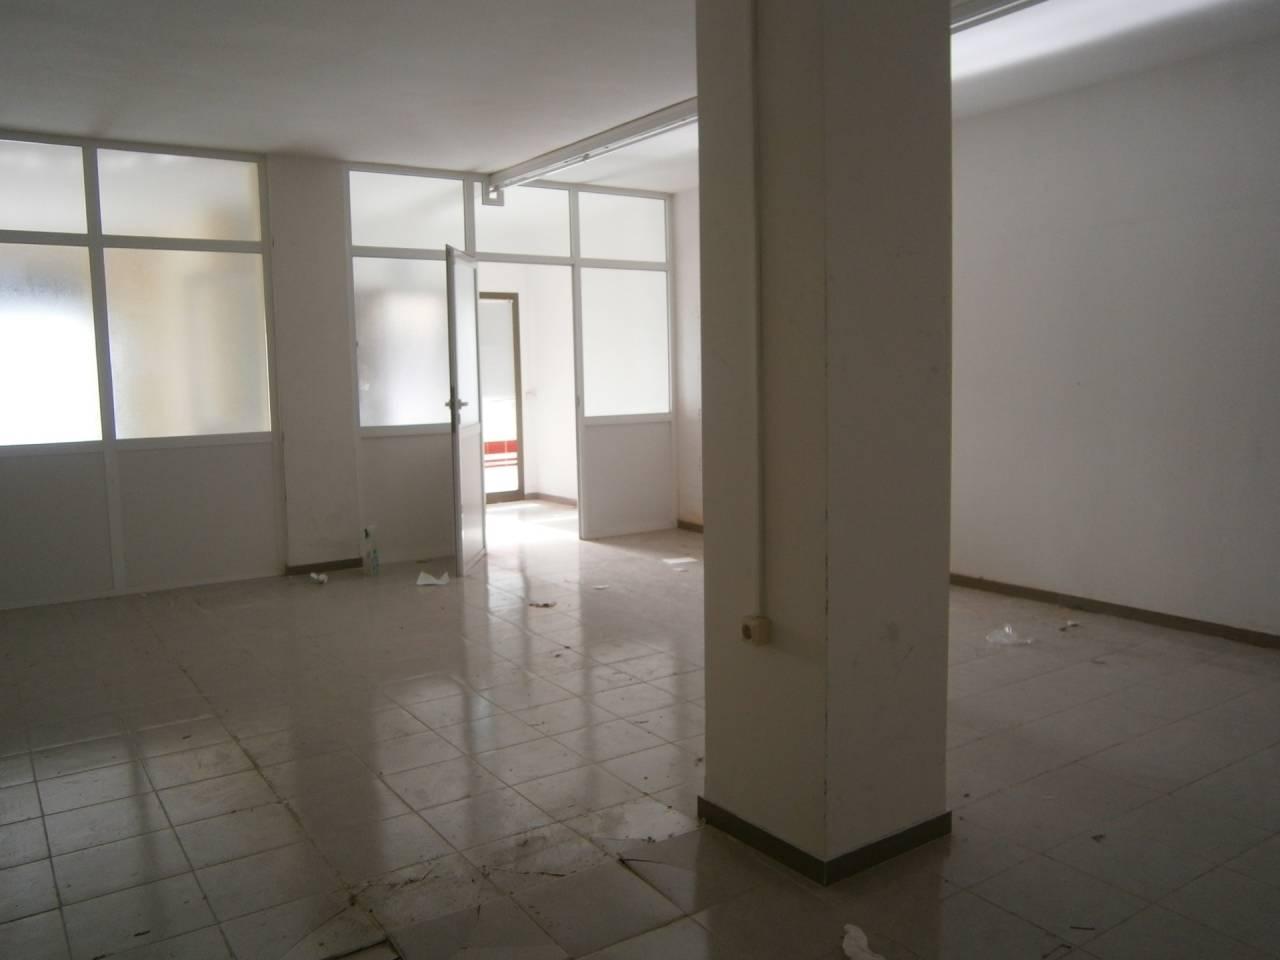 Miete Geschäftsraum  Centre. Local comercial de 93m2. local diáfano perfecto para oficinas, c